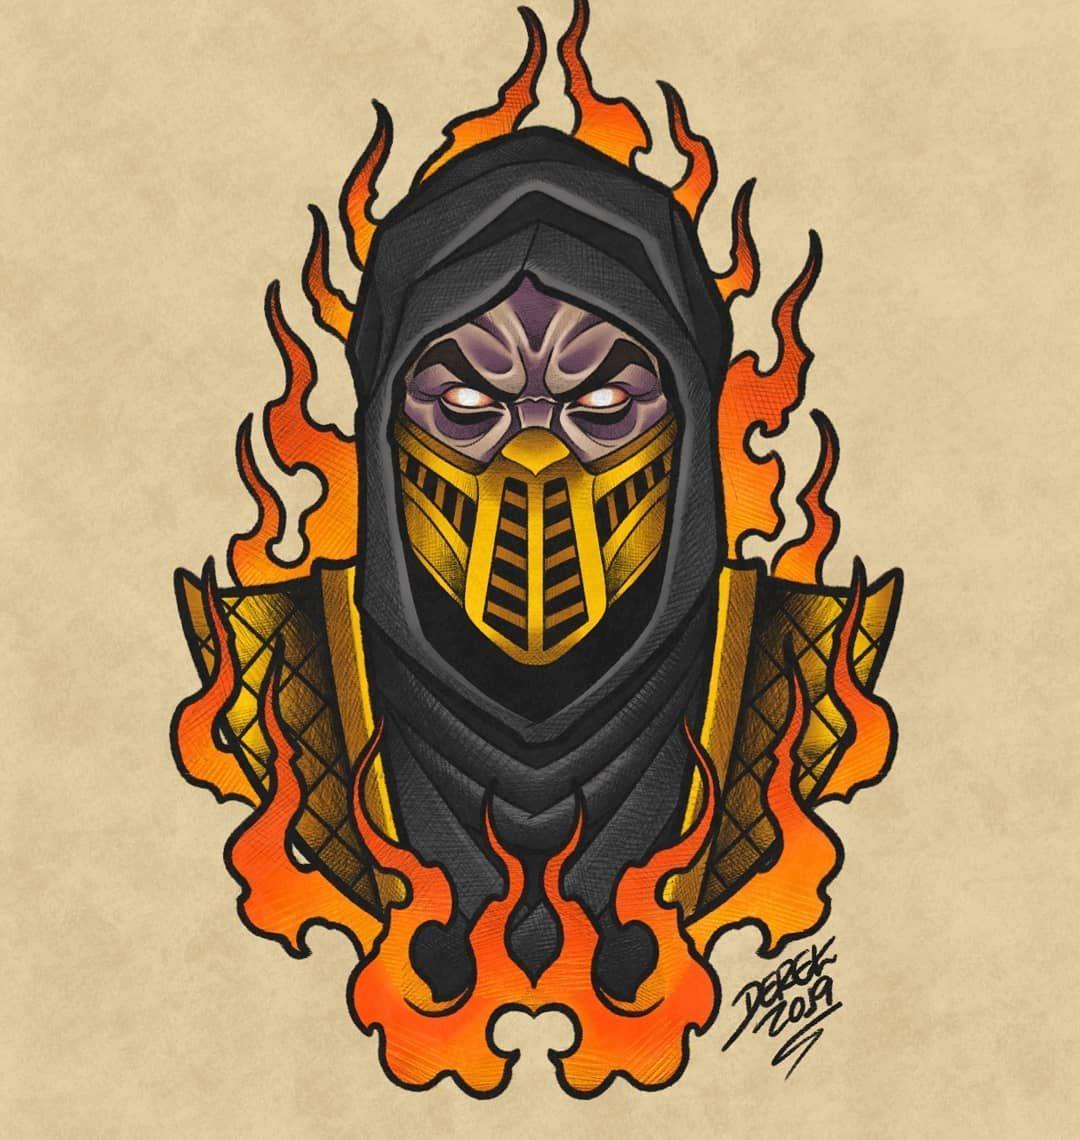 Scorpion Mortal Kombat, Tattoo Design Desenhos, Mortal